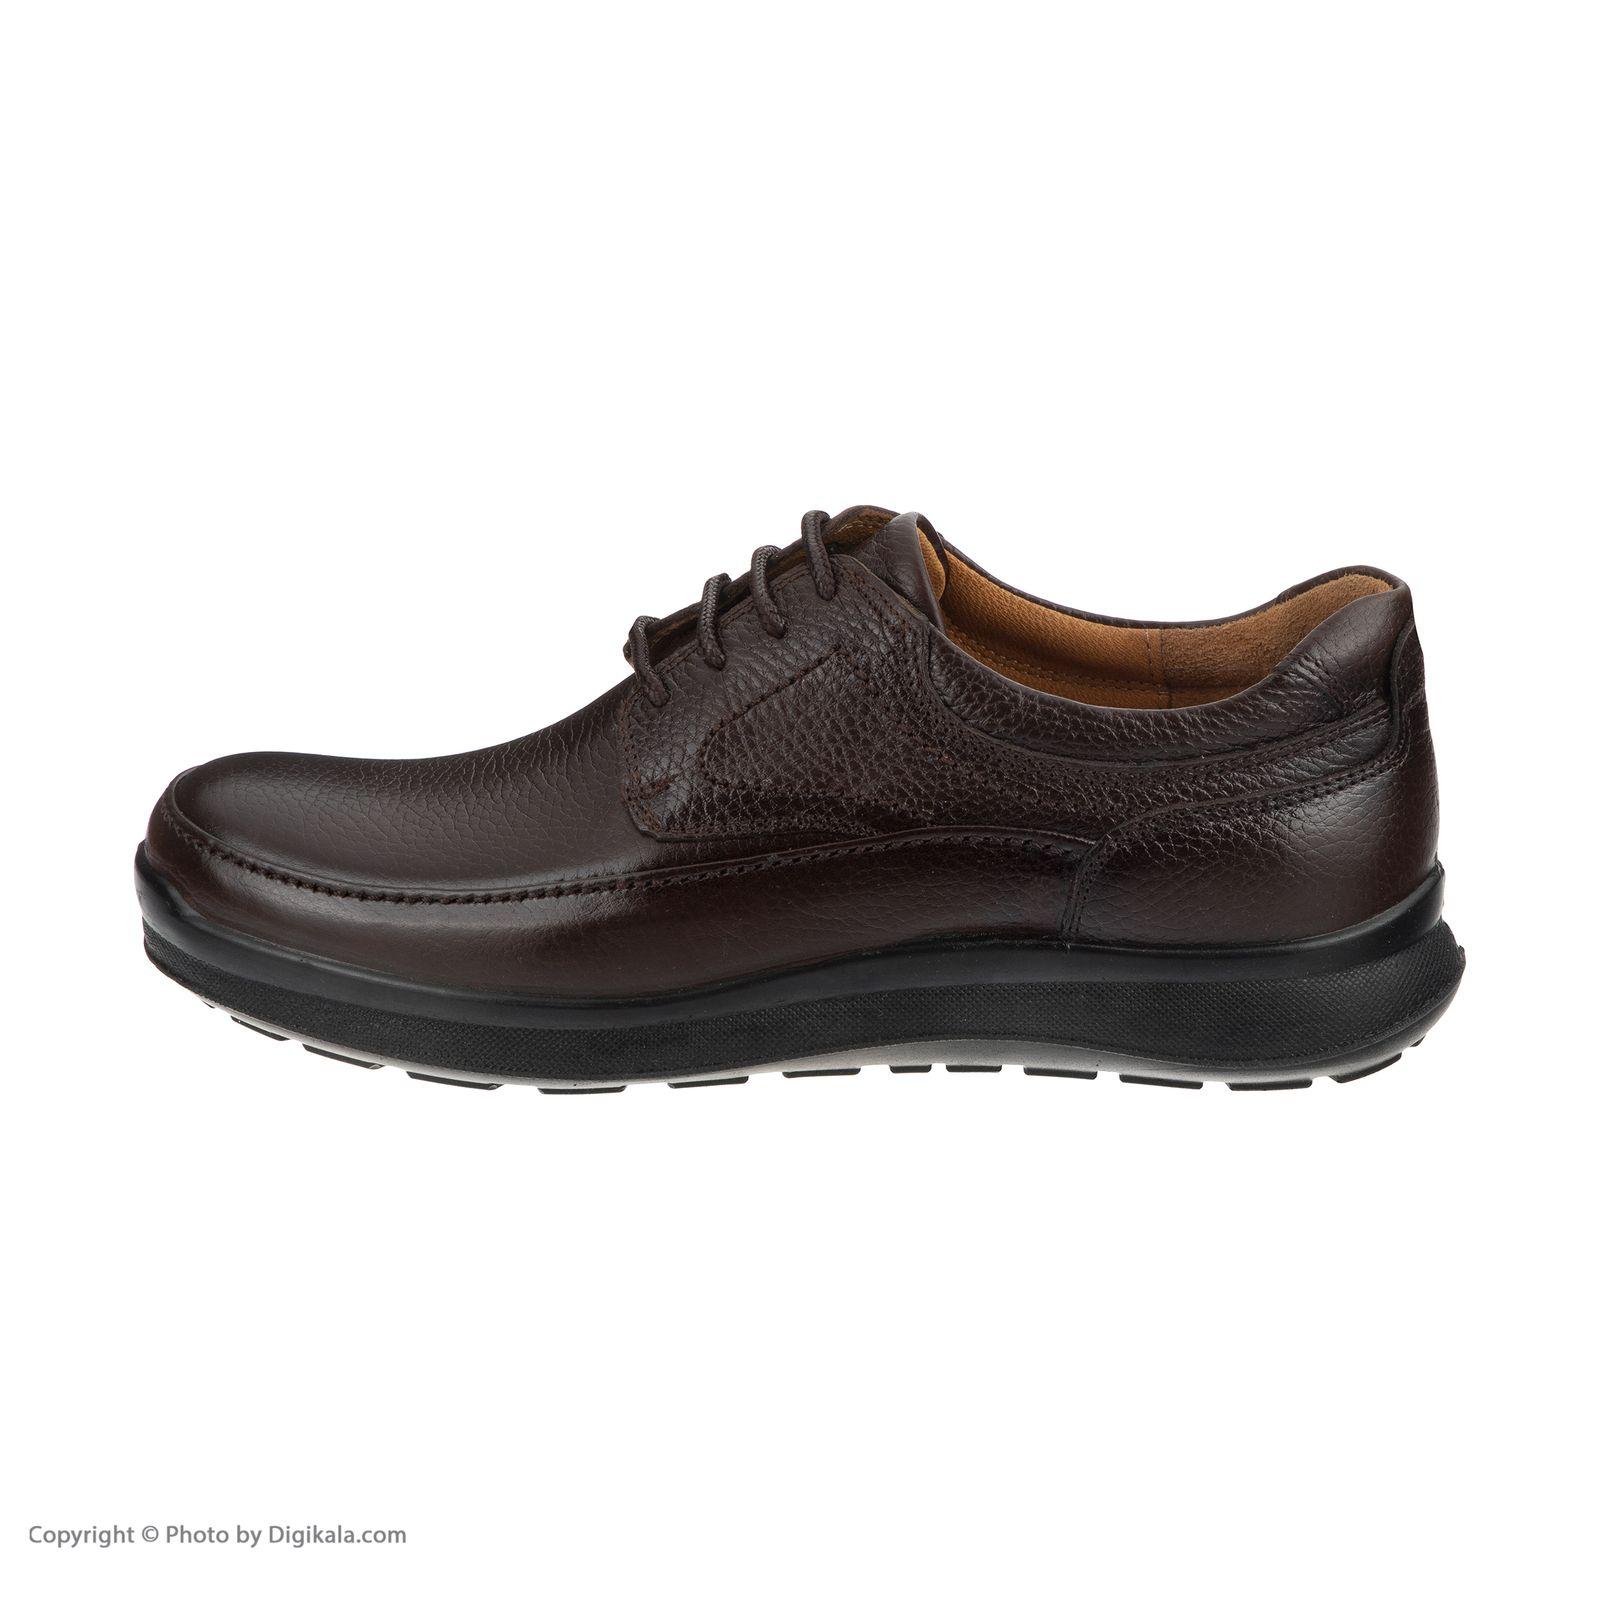 کفش روزمره مردانه بلوط مدل 7266C503104 -  - 3